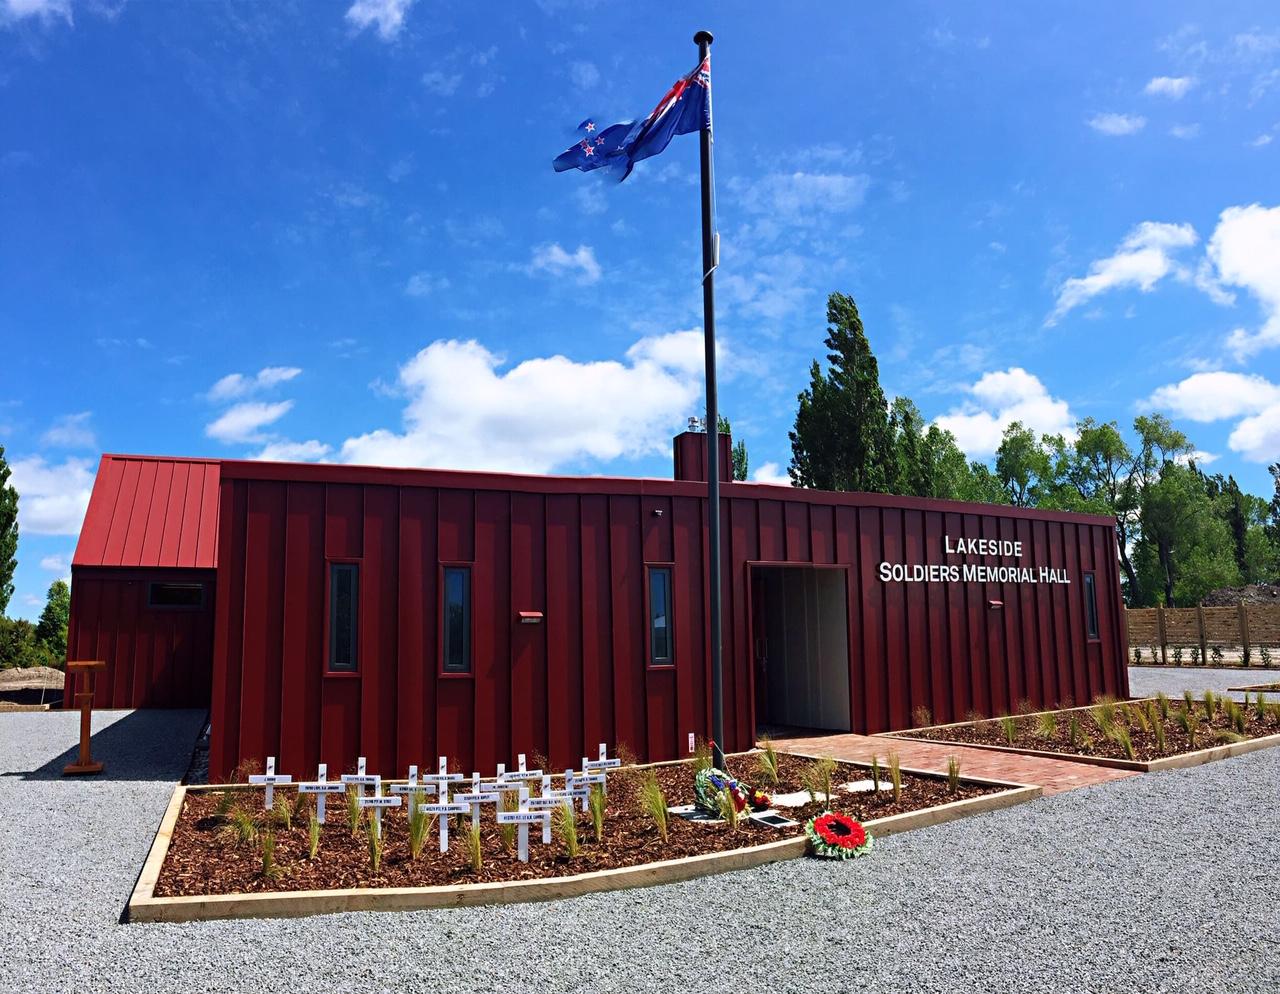 Lakeside Soldiers Memorial Hall